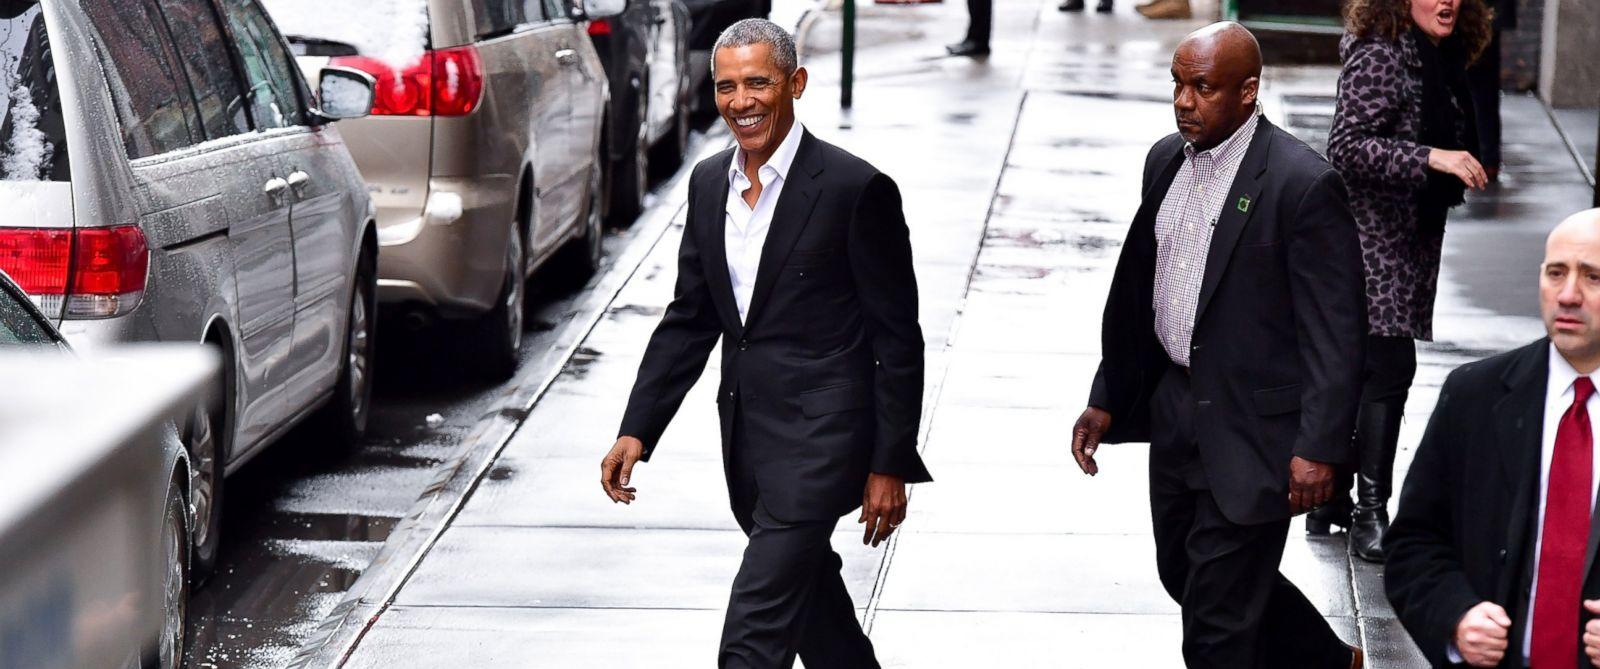 PHOTO: Barack Obama leaves Upland restaurant on March 10, 2017 in New York City.